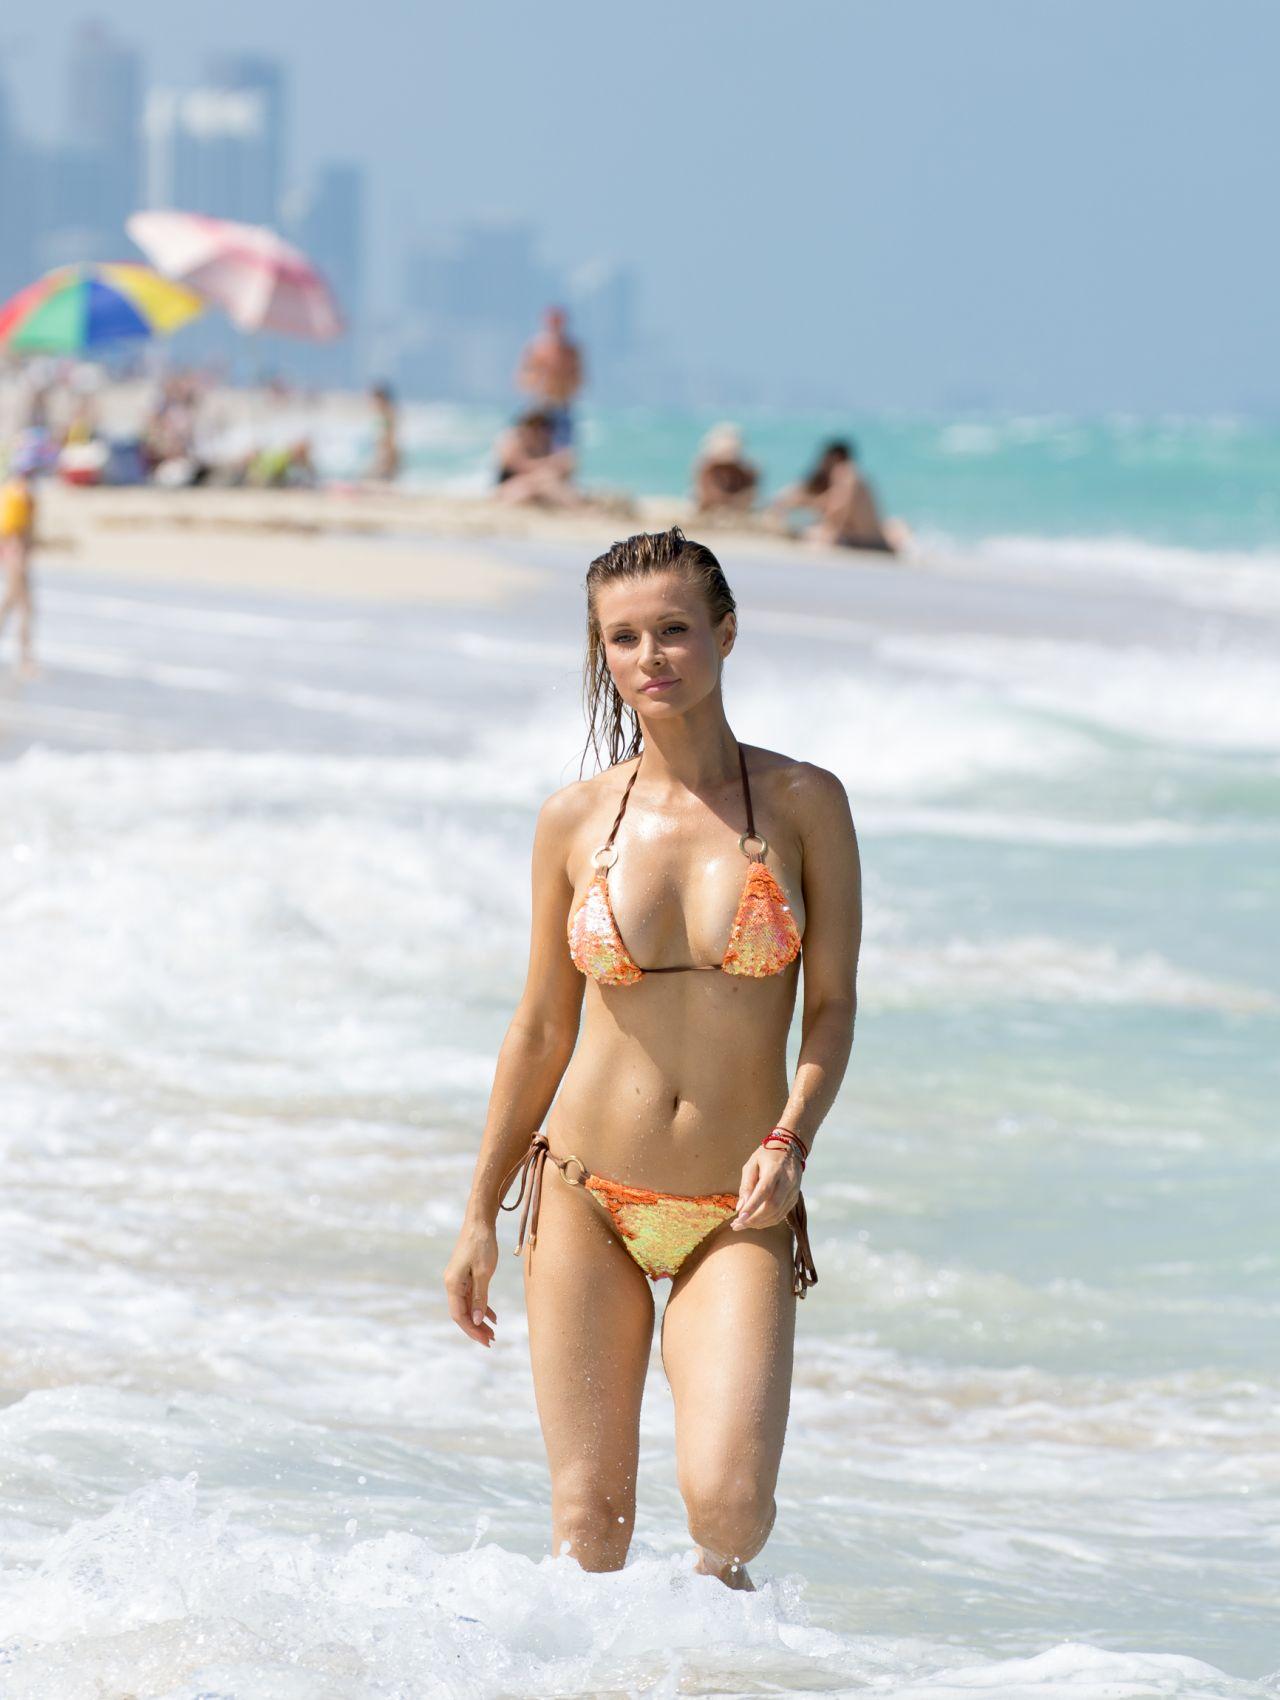 Hot Joanna Krupa nudes (26 photo), Tits, Bikini, Instagram, lingerie 2018